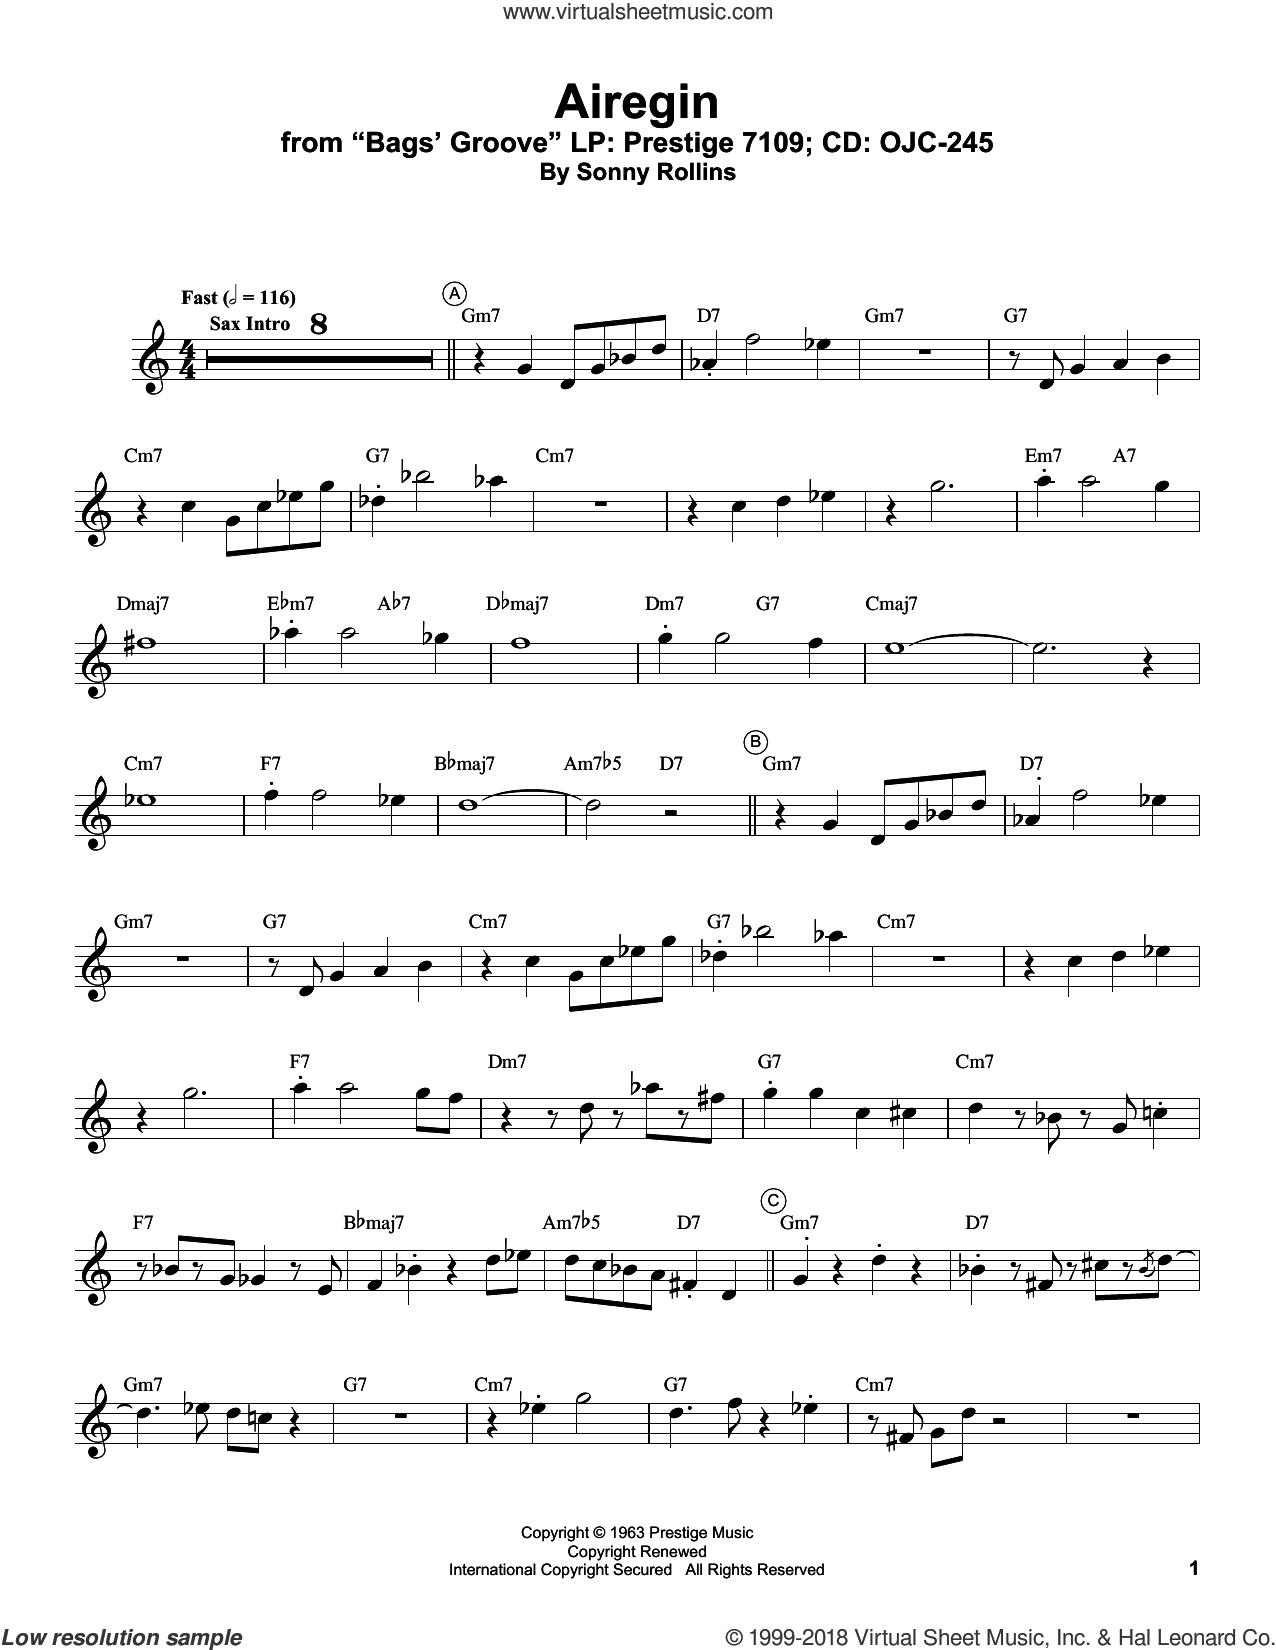 Airegin sheet music for trumpet solo (transcription) by Miles Davis and Sonny Rollins, intermediate trumpet (transcription)